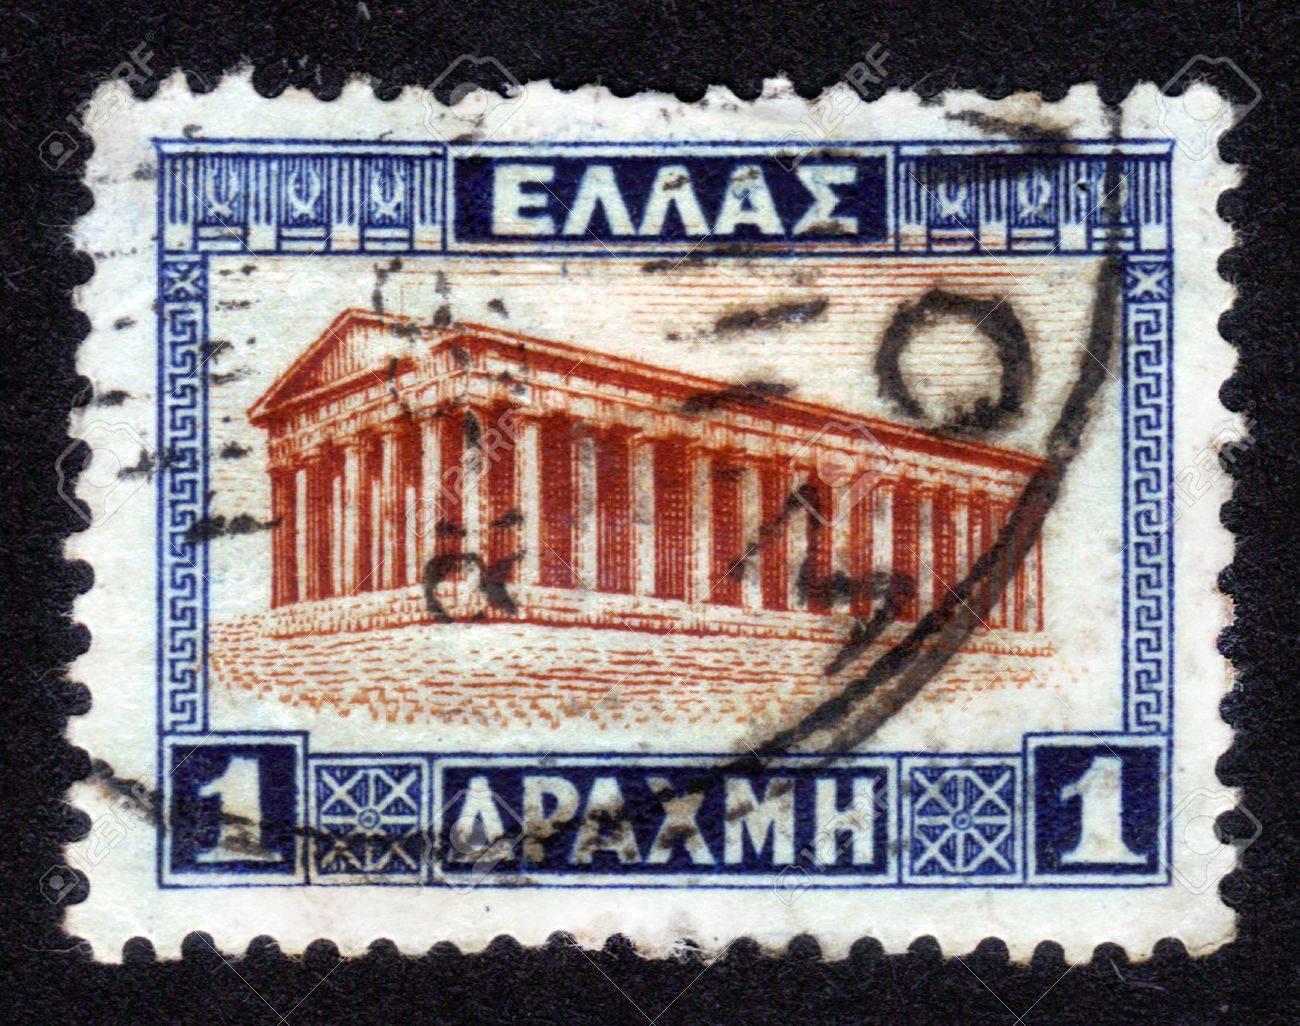 GREECE - CIRCA 1927: A stamp printed in Greece shows Temple of Hephaestus, Athens, circa 1927 Stock Photo - 14264299